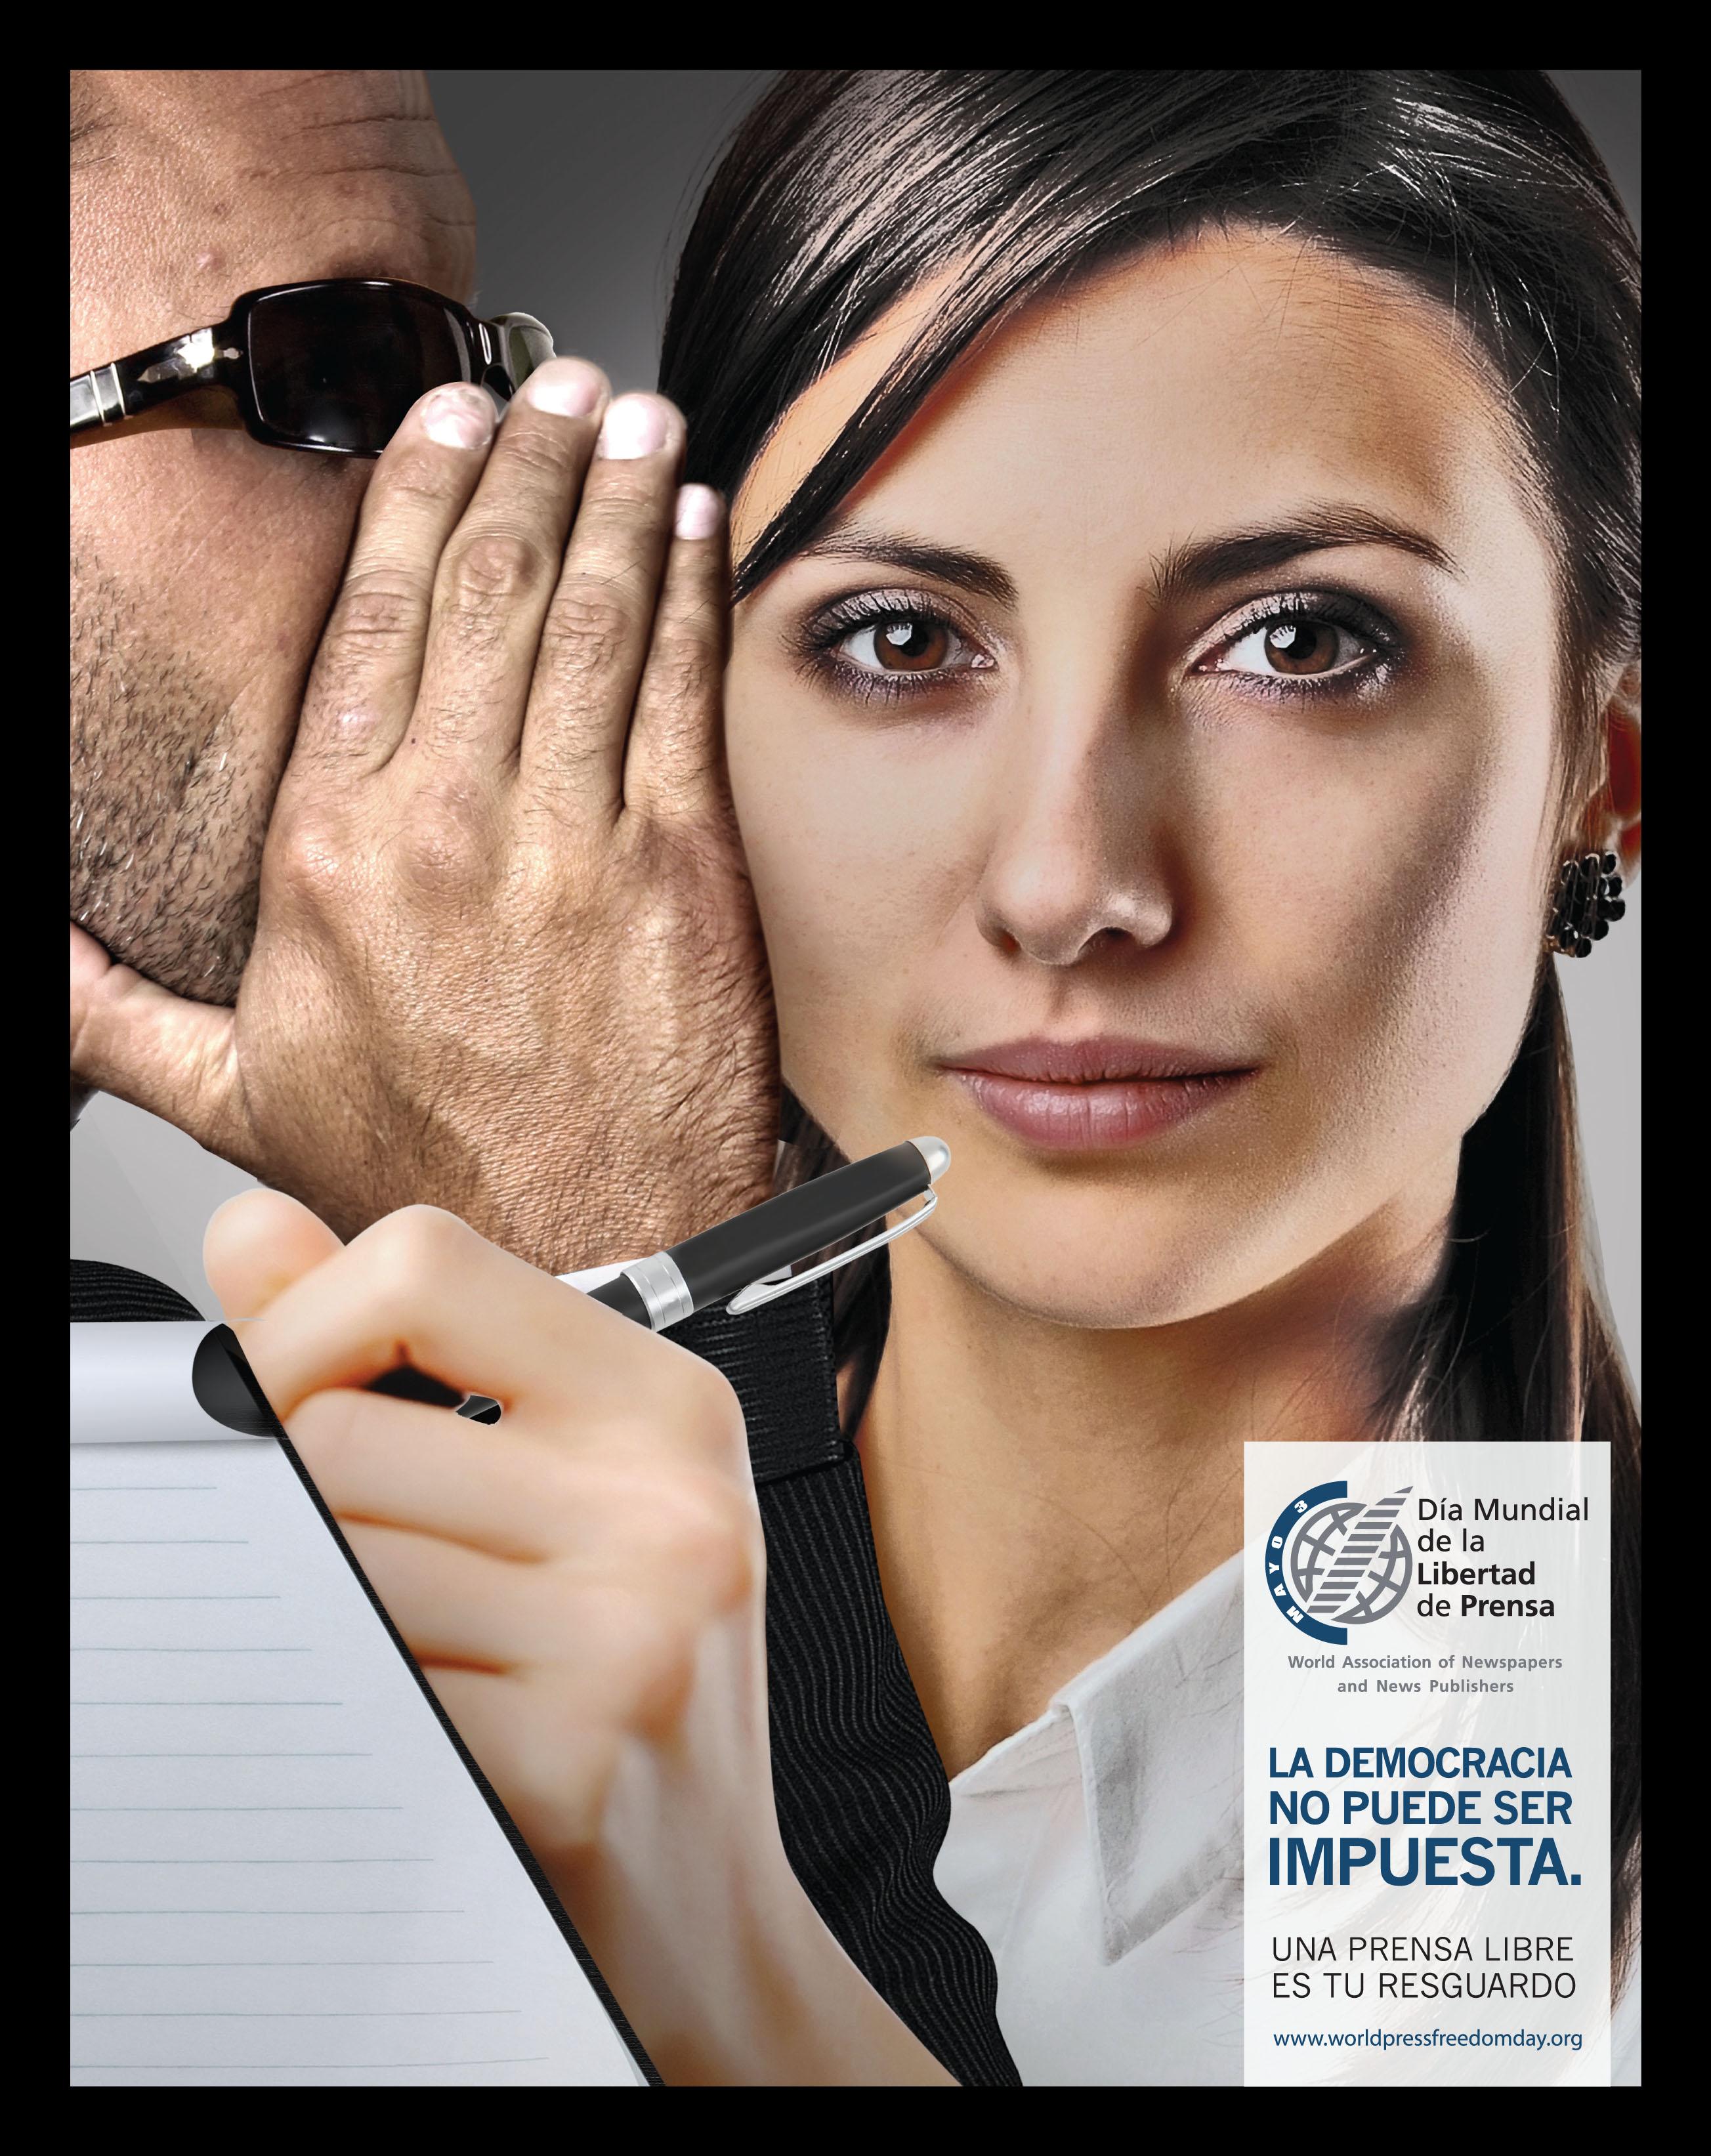 worldpressfreedomday2013_women_s